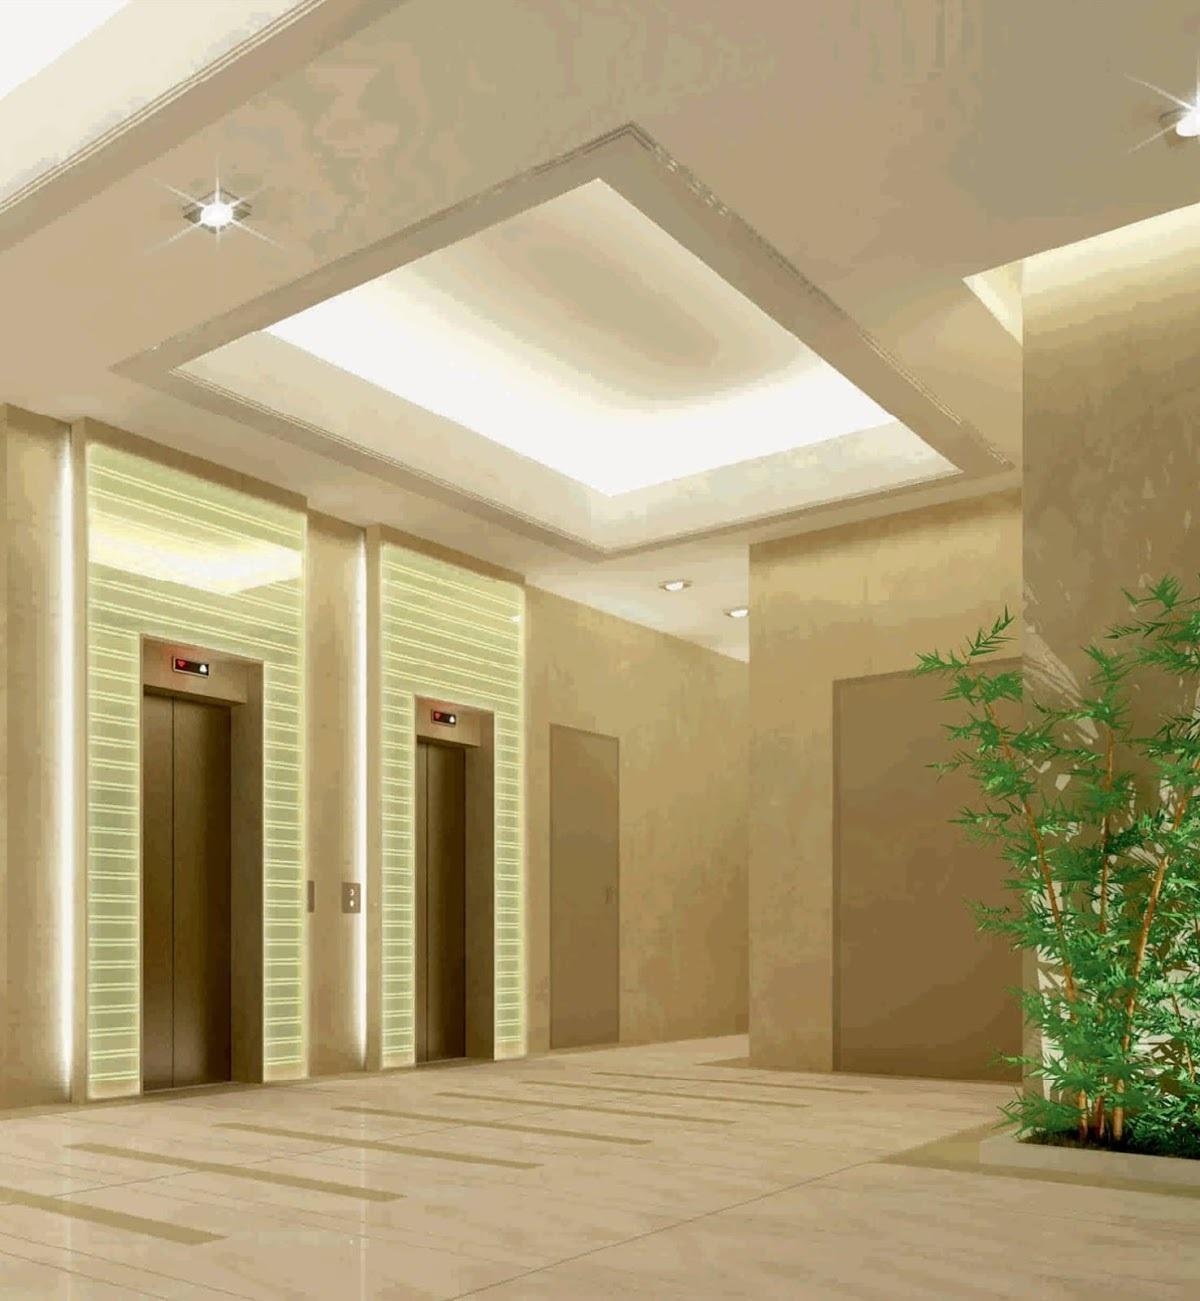 vardhman flora phase 2 project apartment interiors1